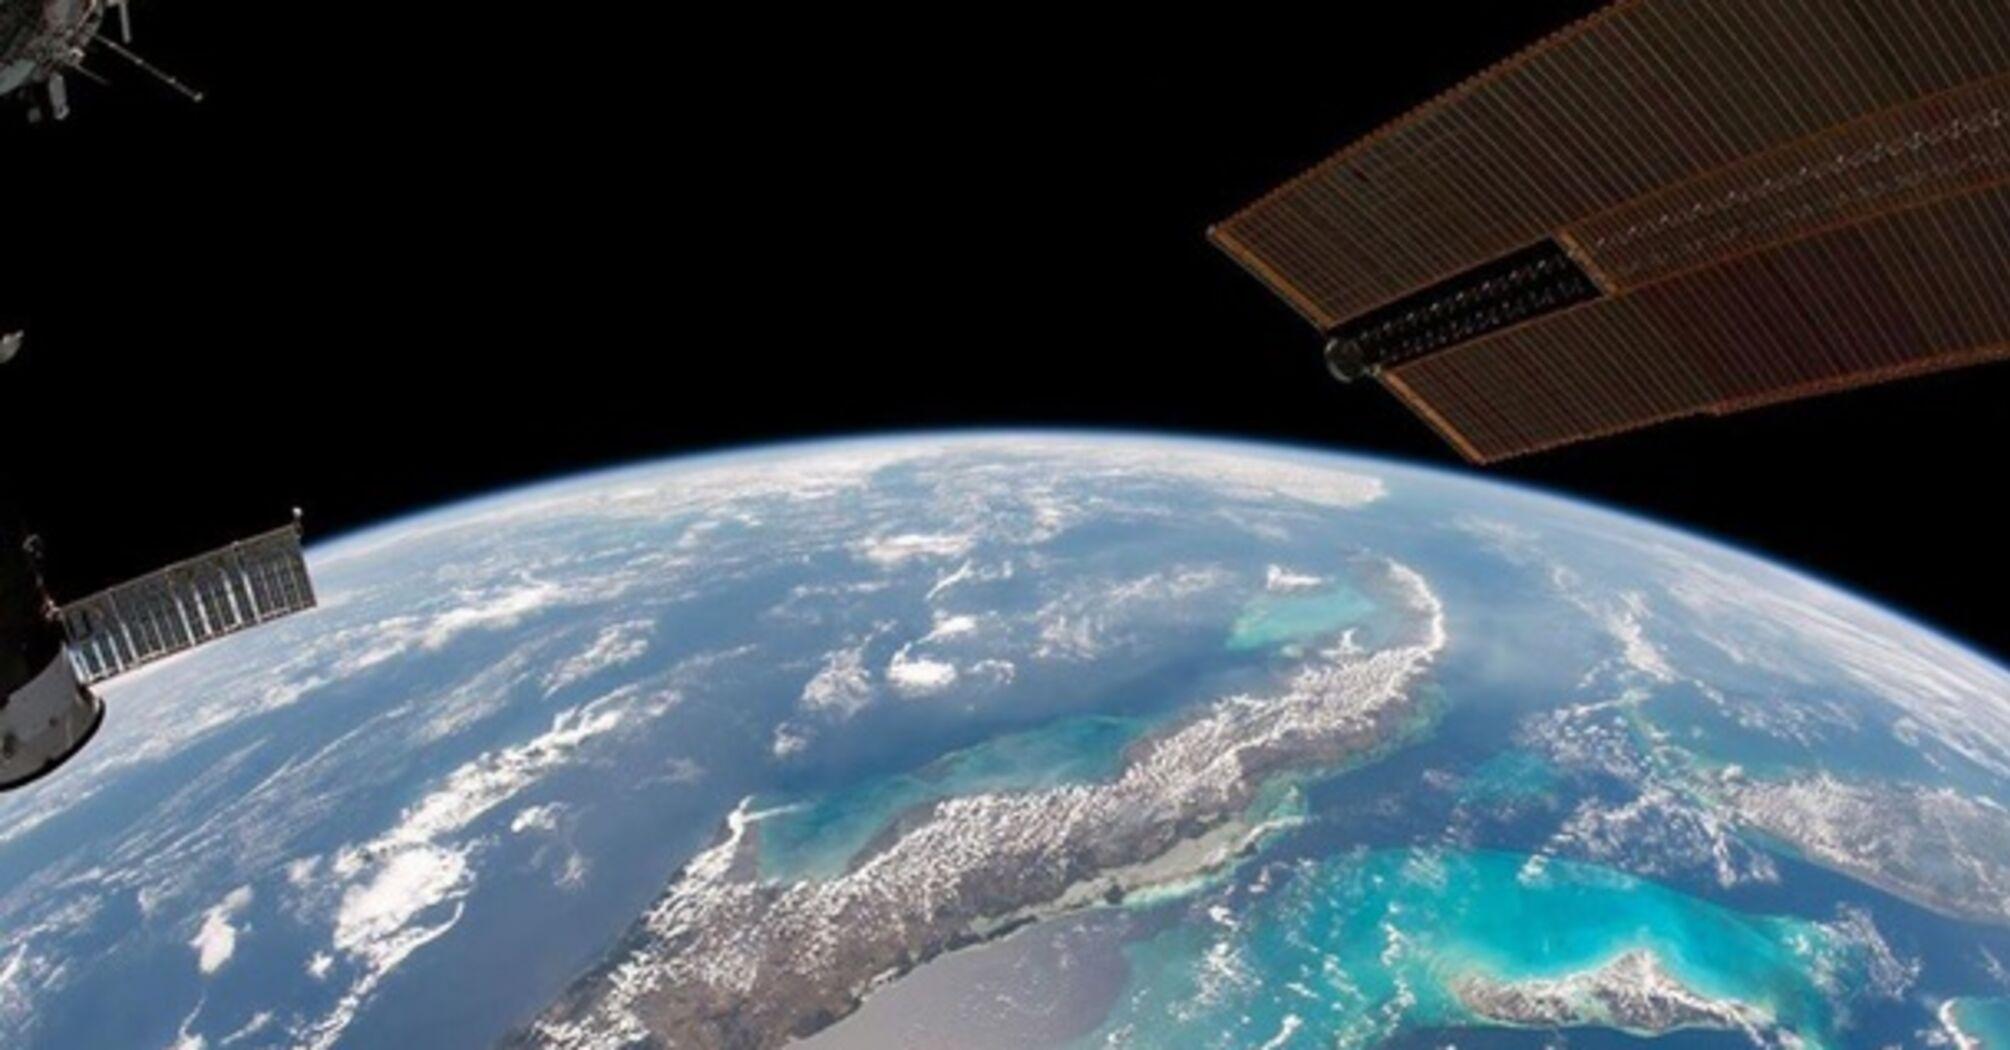 NASA опублікувала вражаюче фото Землі з космосу